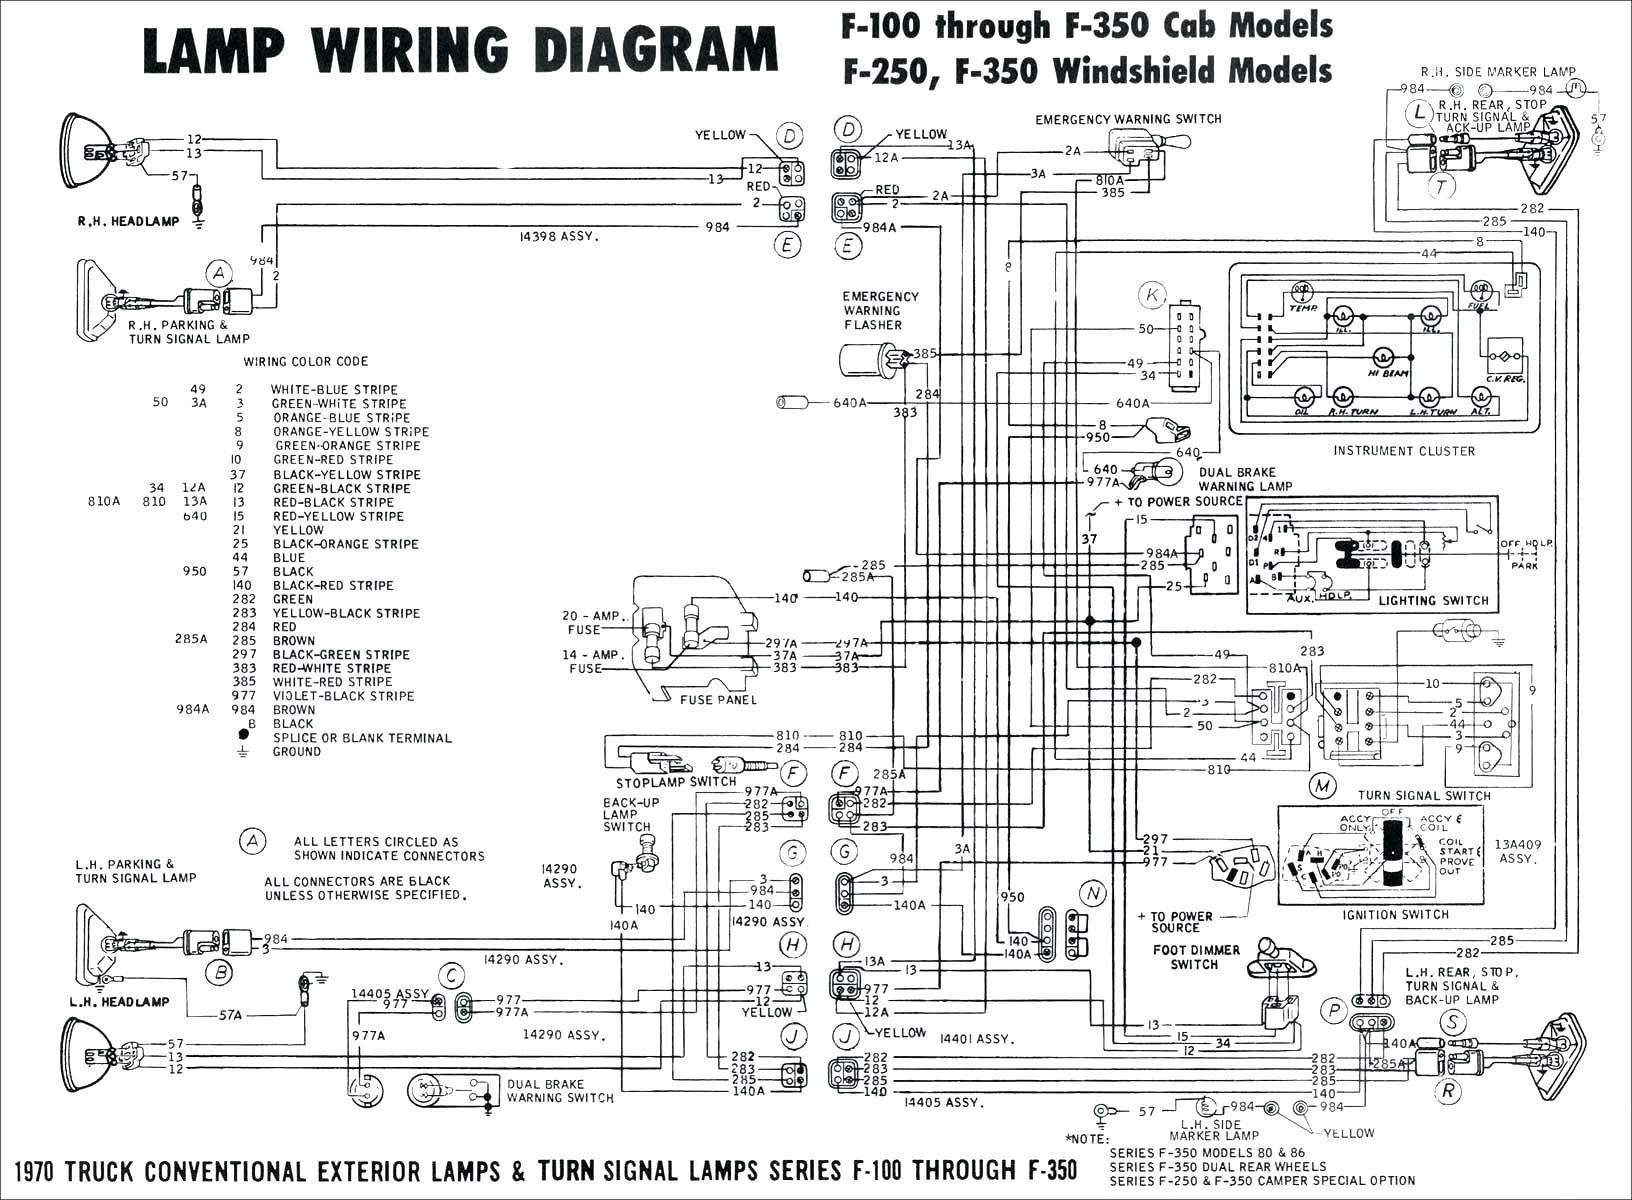 Diagram Honda Civic Srs Wiring Diagram Full Version Hd Quality Wiring Diagram Diagramhoytm Apd Audax It